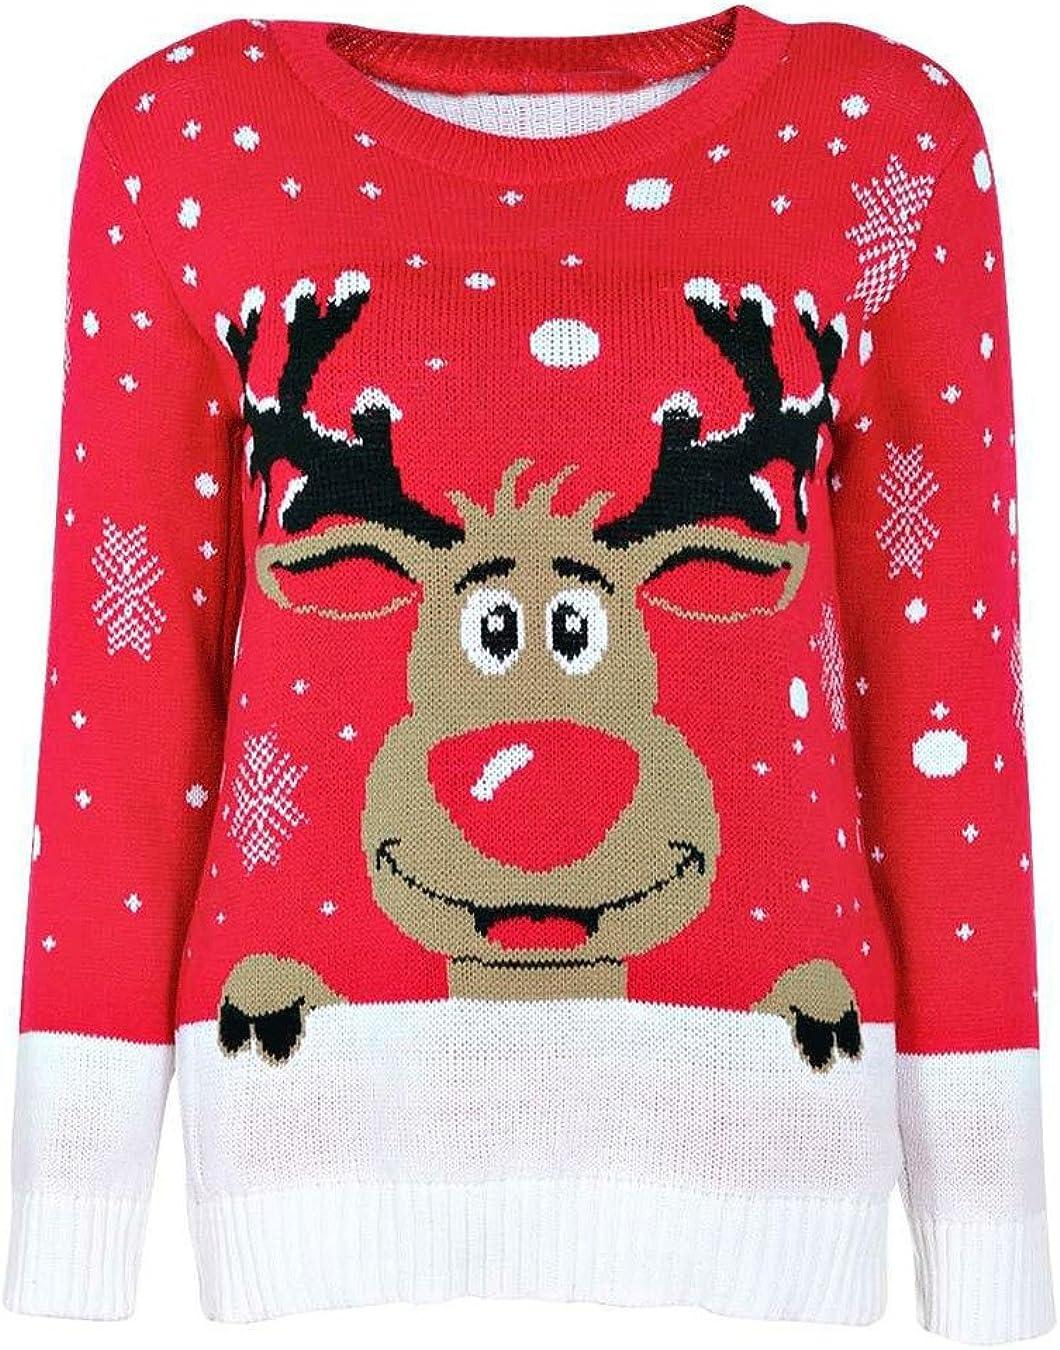 UK S-XL Divadames New Reindeer Snowflake Knitted Unisex Christmas Jumper